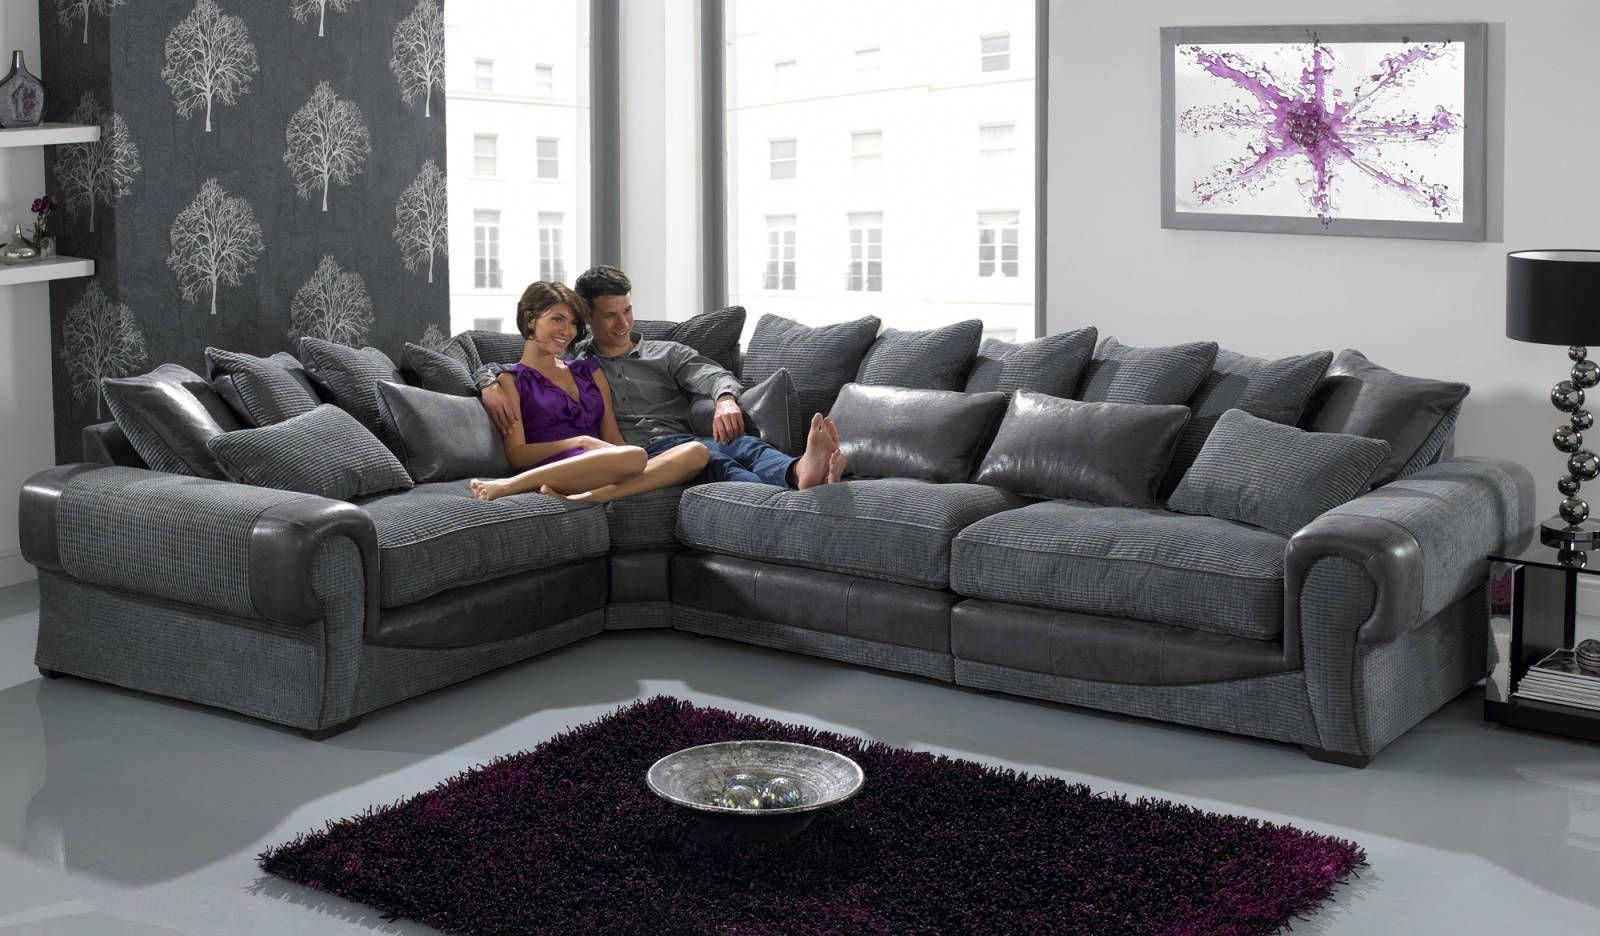 Trevena Sofology Best Leather Sofa Sofa Deals Fabric Sofa